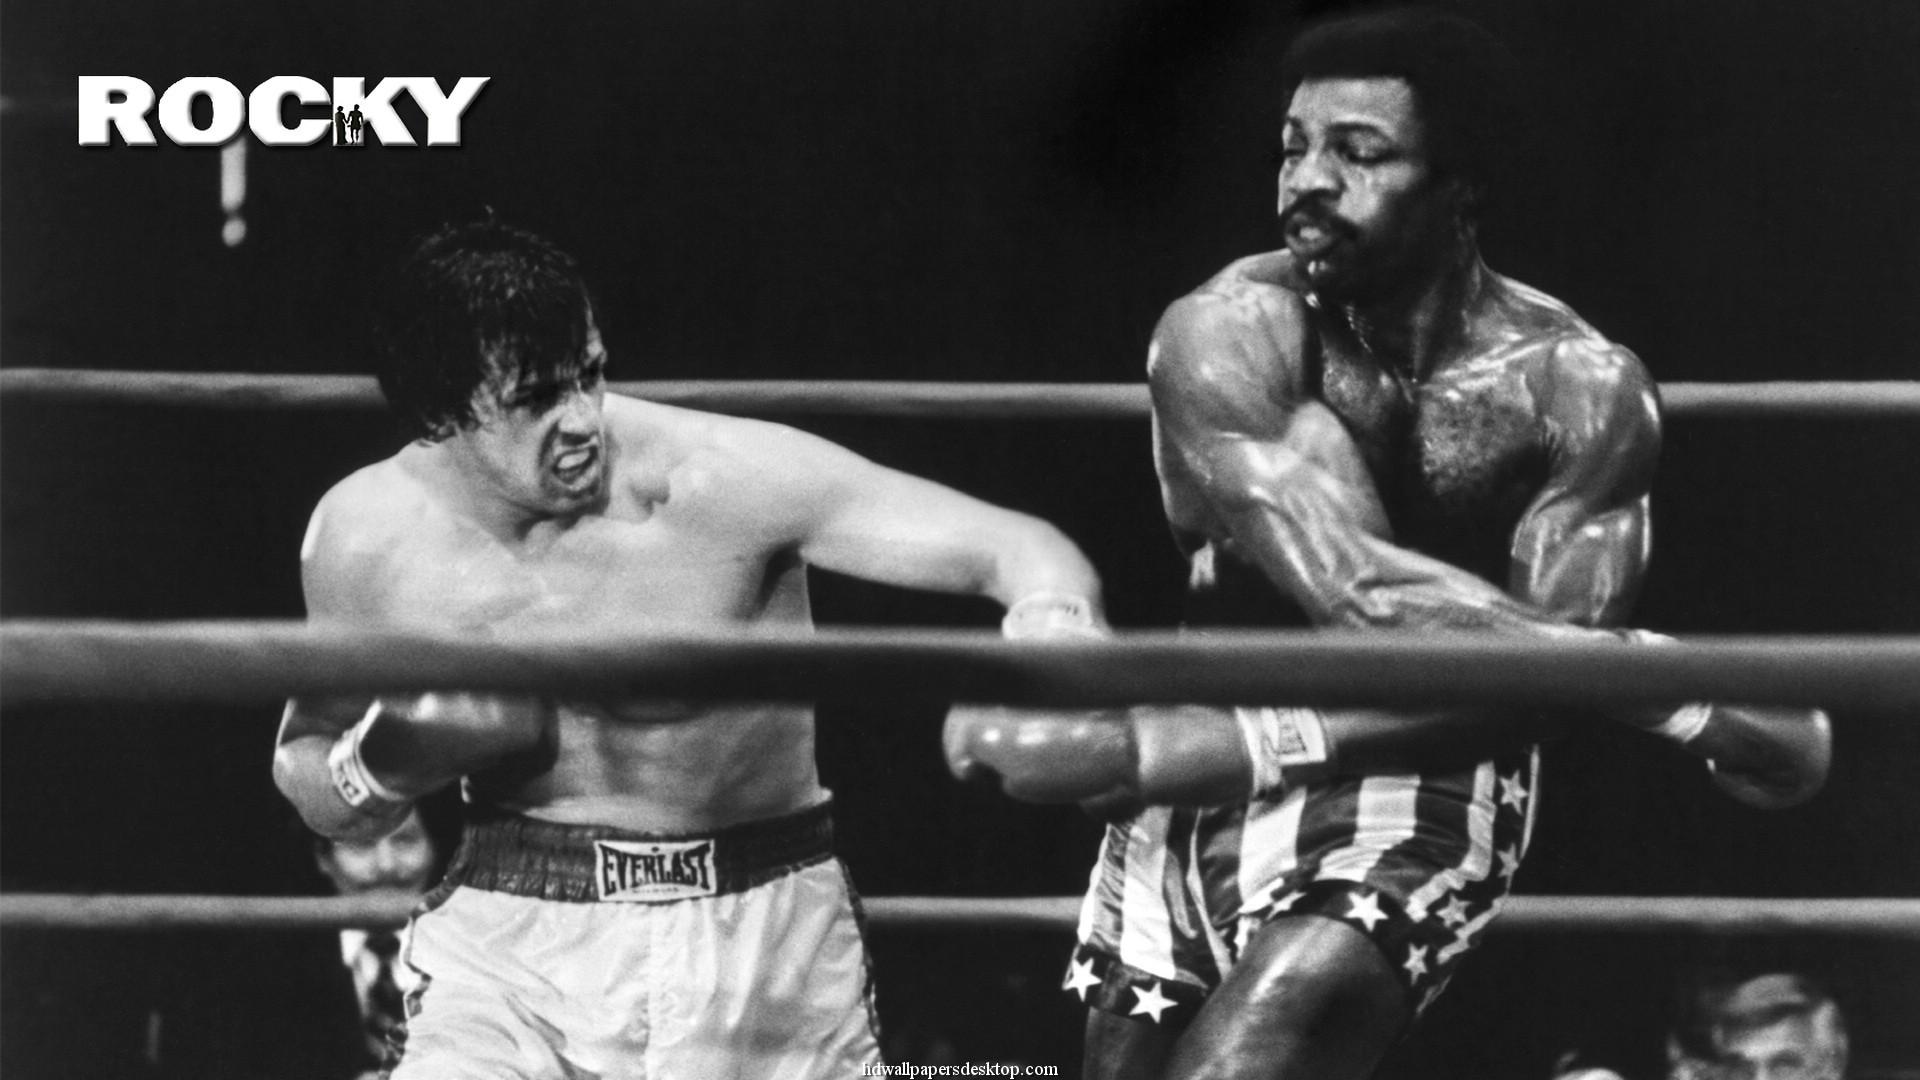 Rocky Wallpapers HD - WallpaperSafari